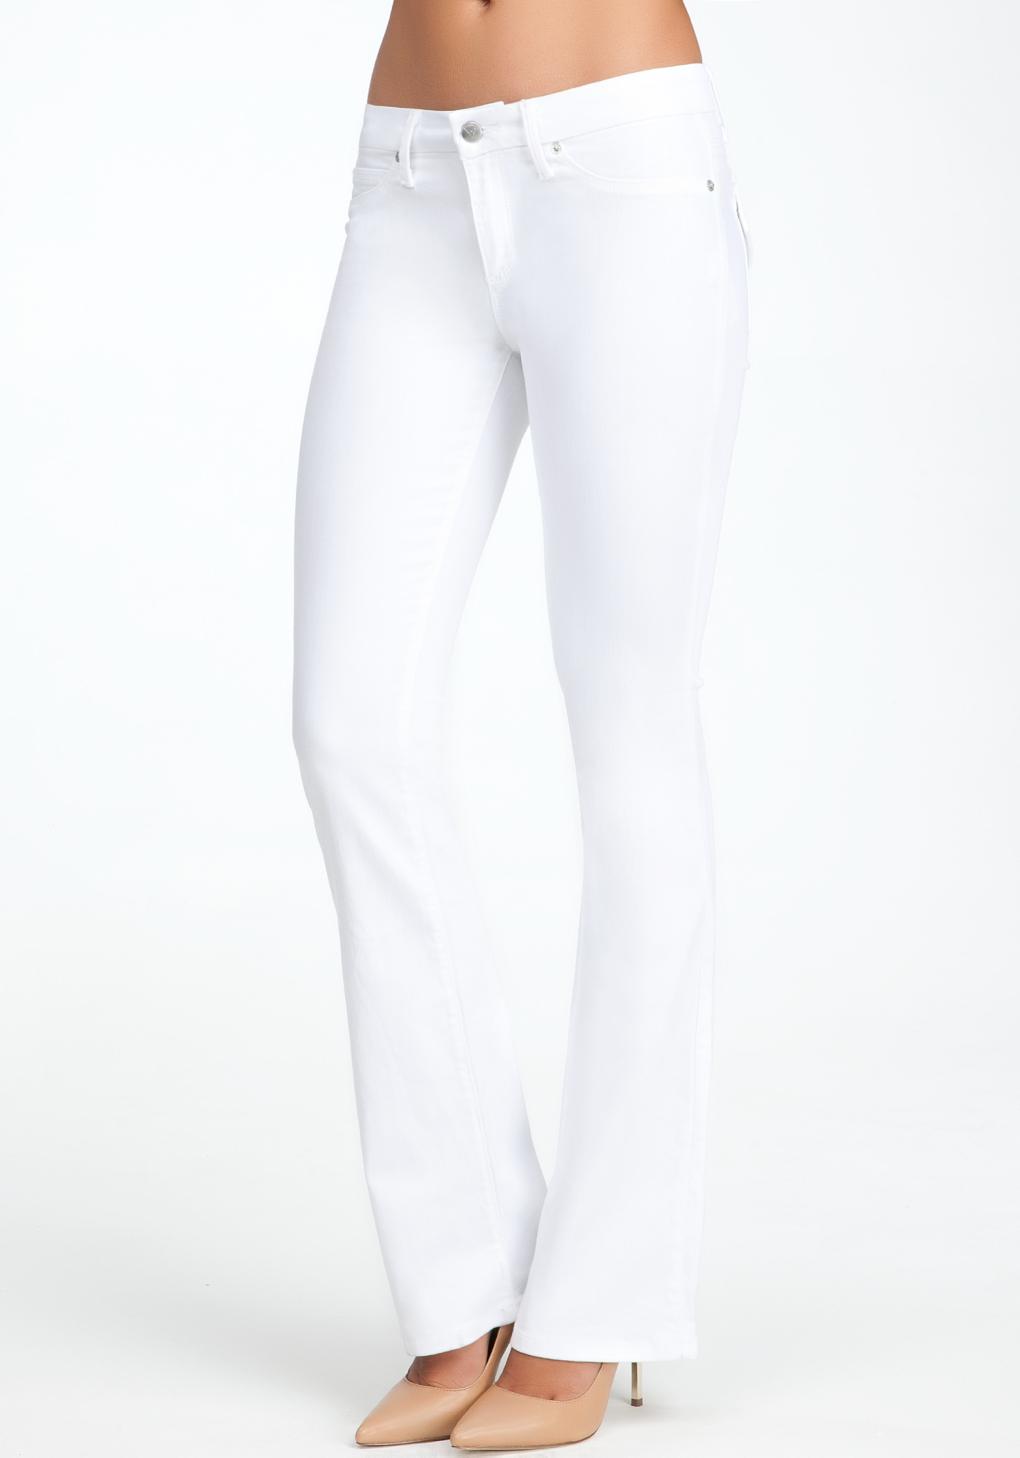 Bebe Flap Pocket Bootcut Jeans in White   Lyst